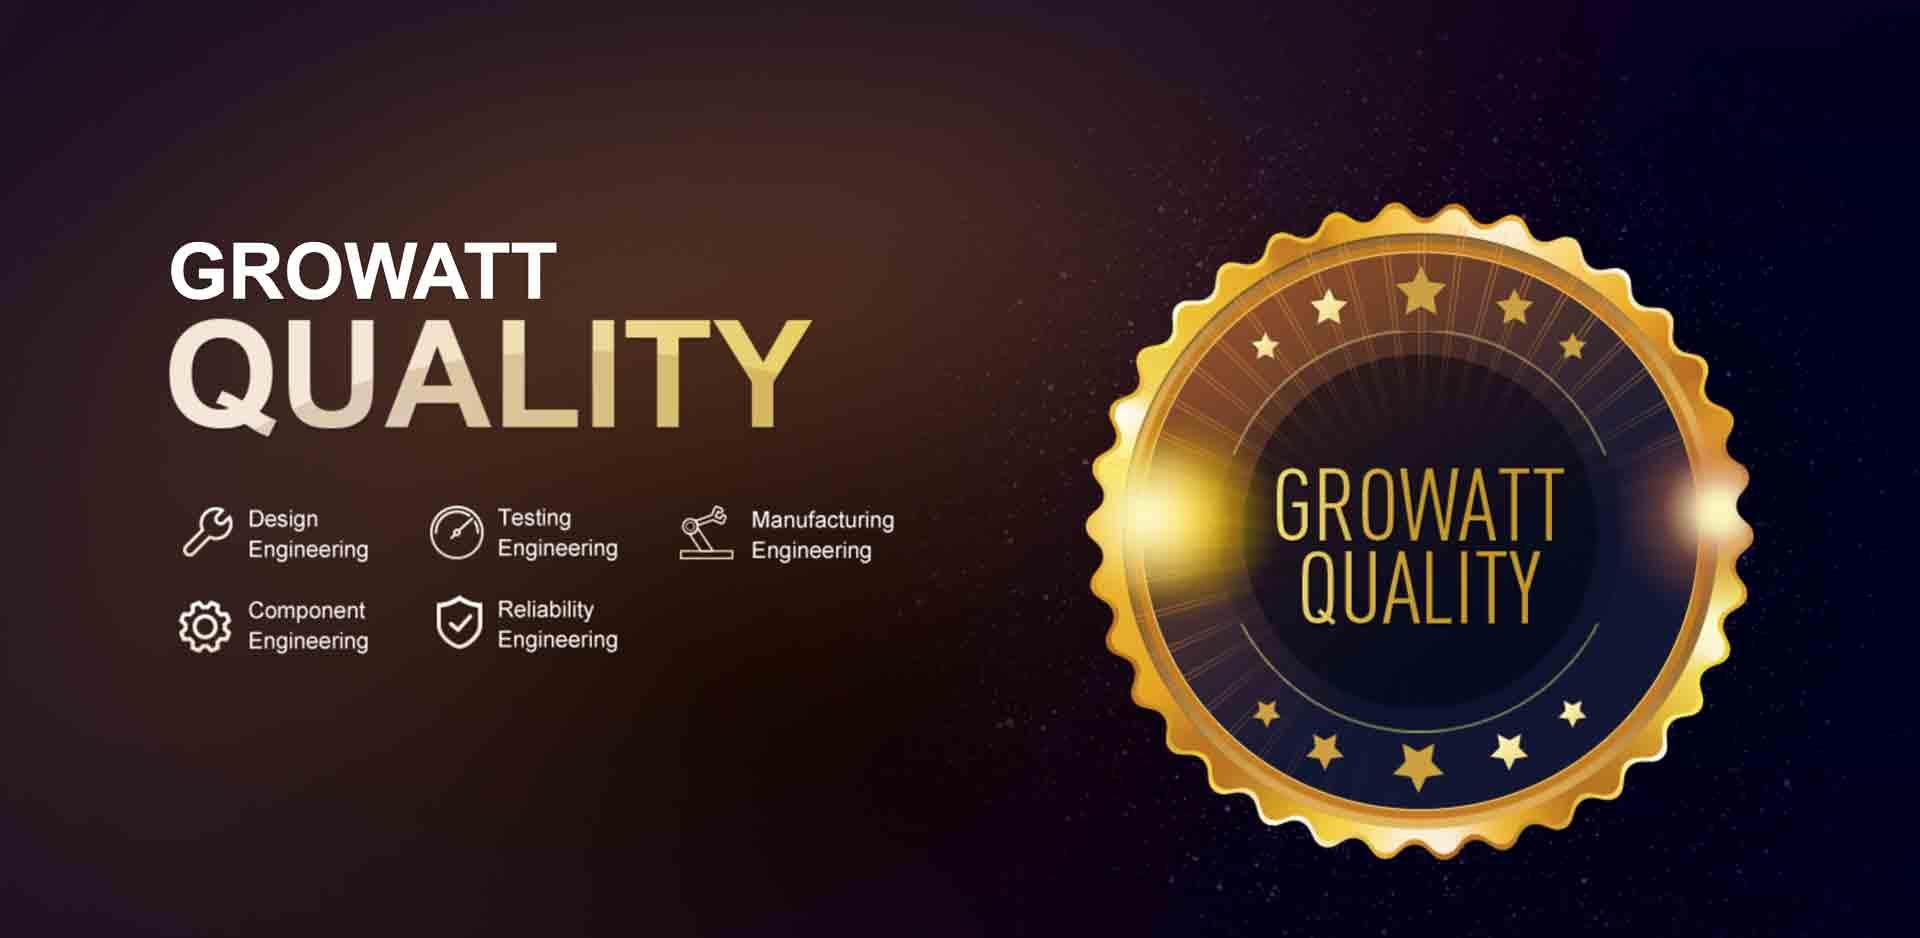 Growatt-quality